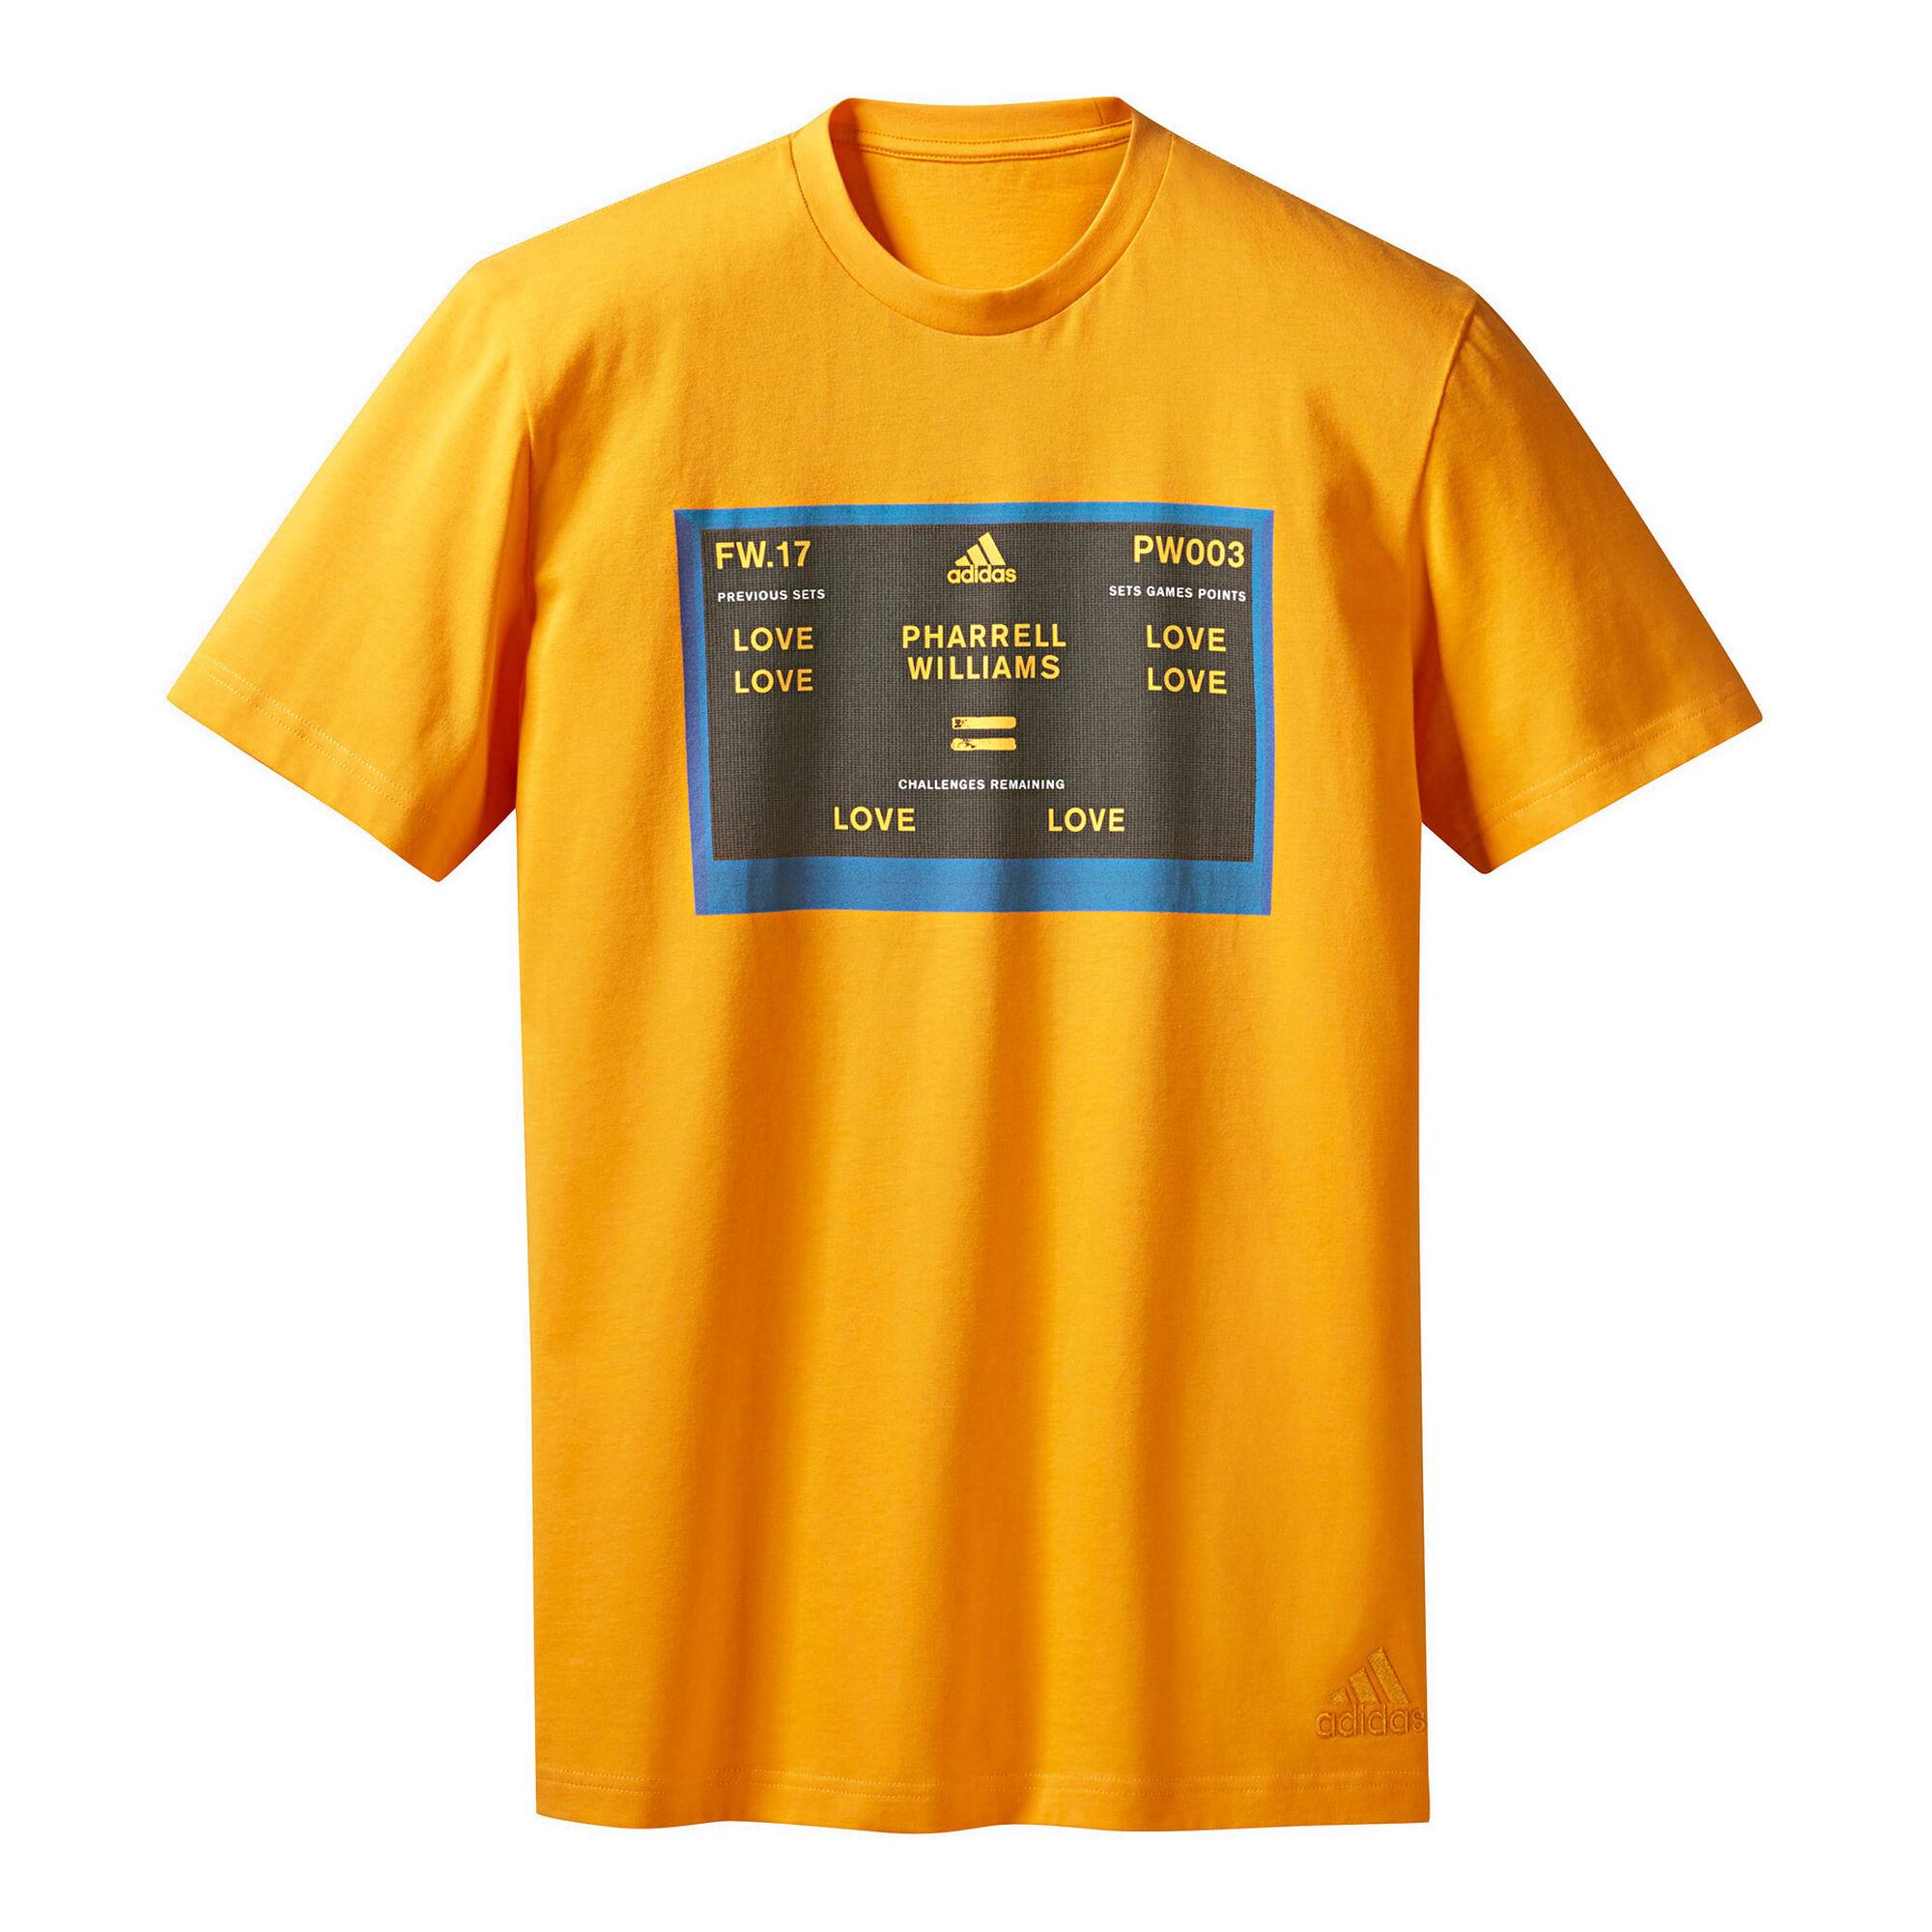 40e191a923c adidas · adidas · adidas · adidas · adidas · adidas · adidas · adidas ·  adidas. New York Graphic Tee ...